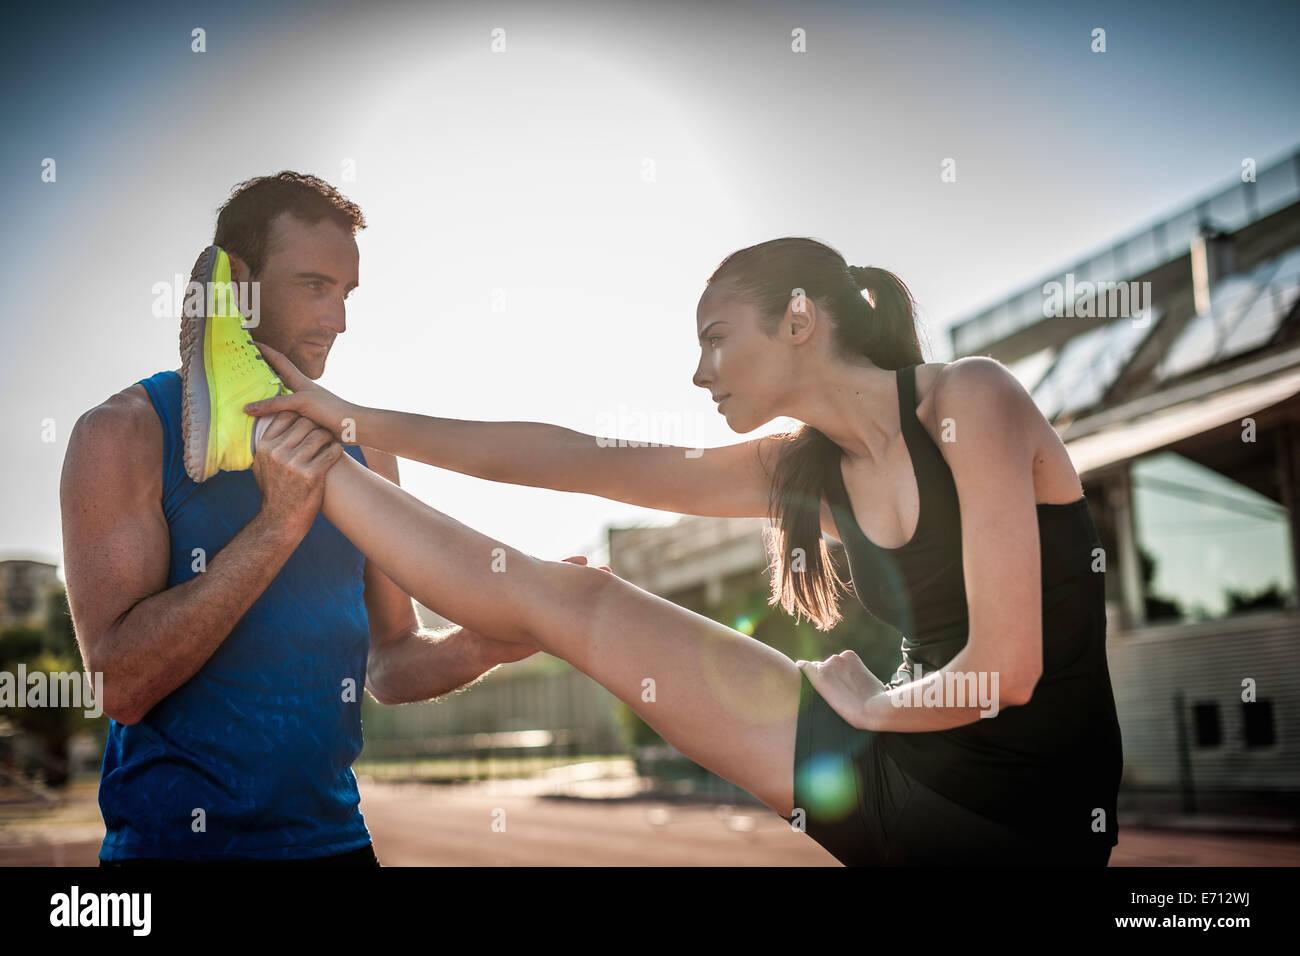 Man helping woman stretch leg - Stock Image